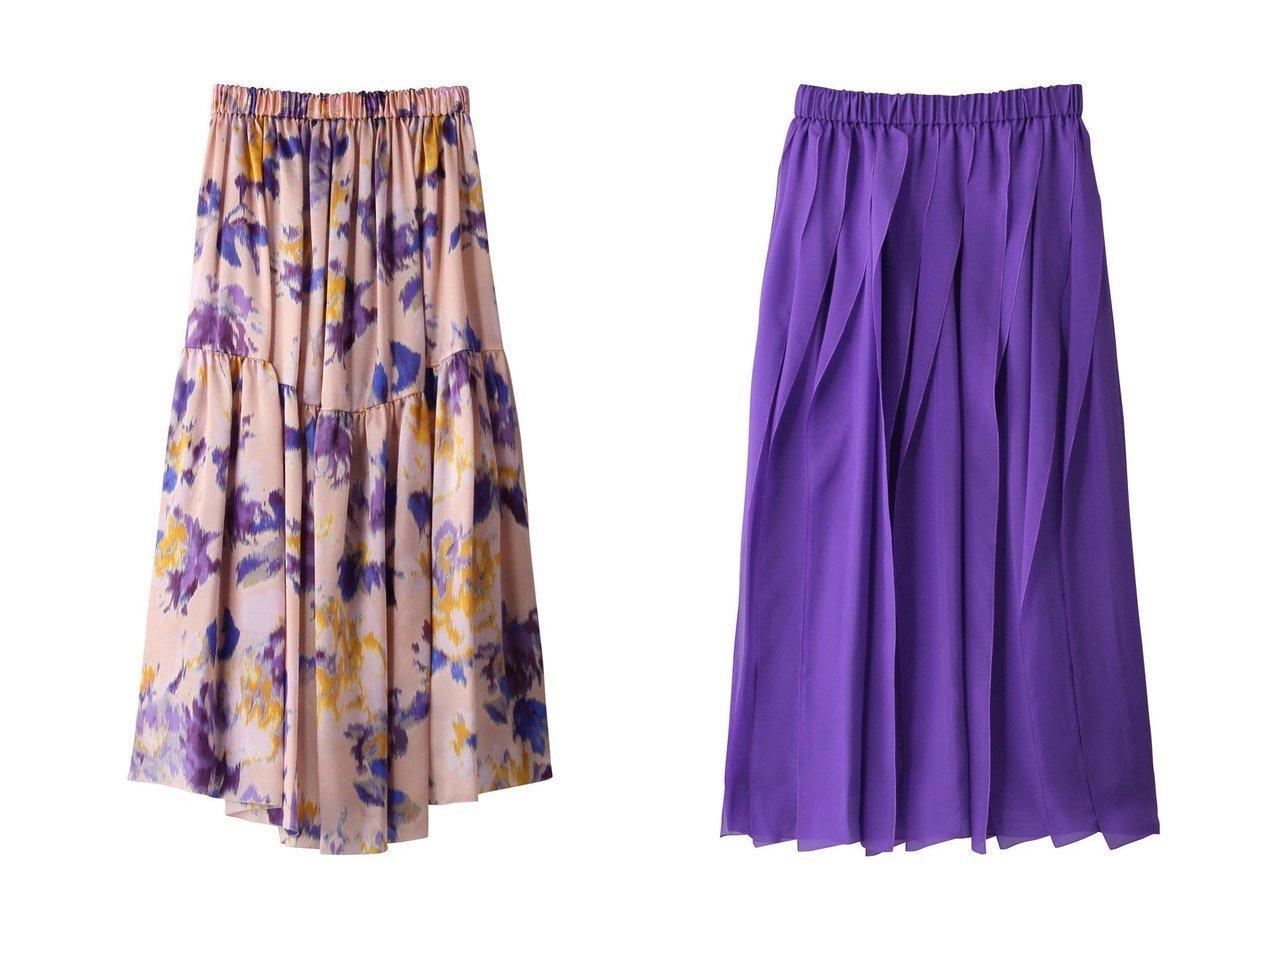 【BLAMINK/ブラミンク】のシルクギャザースカート&シルクプリントギャザースカート スカートのおすすめ!人気、レディースファッションの通販 おすすめで人気のファッション通販商品 インテリア・家具・キッズファッション・メンズファッション・レディースファッション・服の通販 founy(ファニー) https://founy.com/ ファッション Fashion レディース WOMEN スカート Skirt ロングスカート Long Skirt ギャザー シルク プリント ロング |ID:crp329100000001184